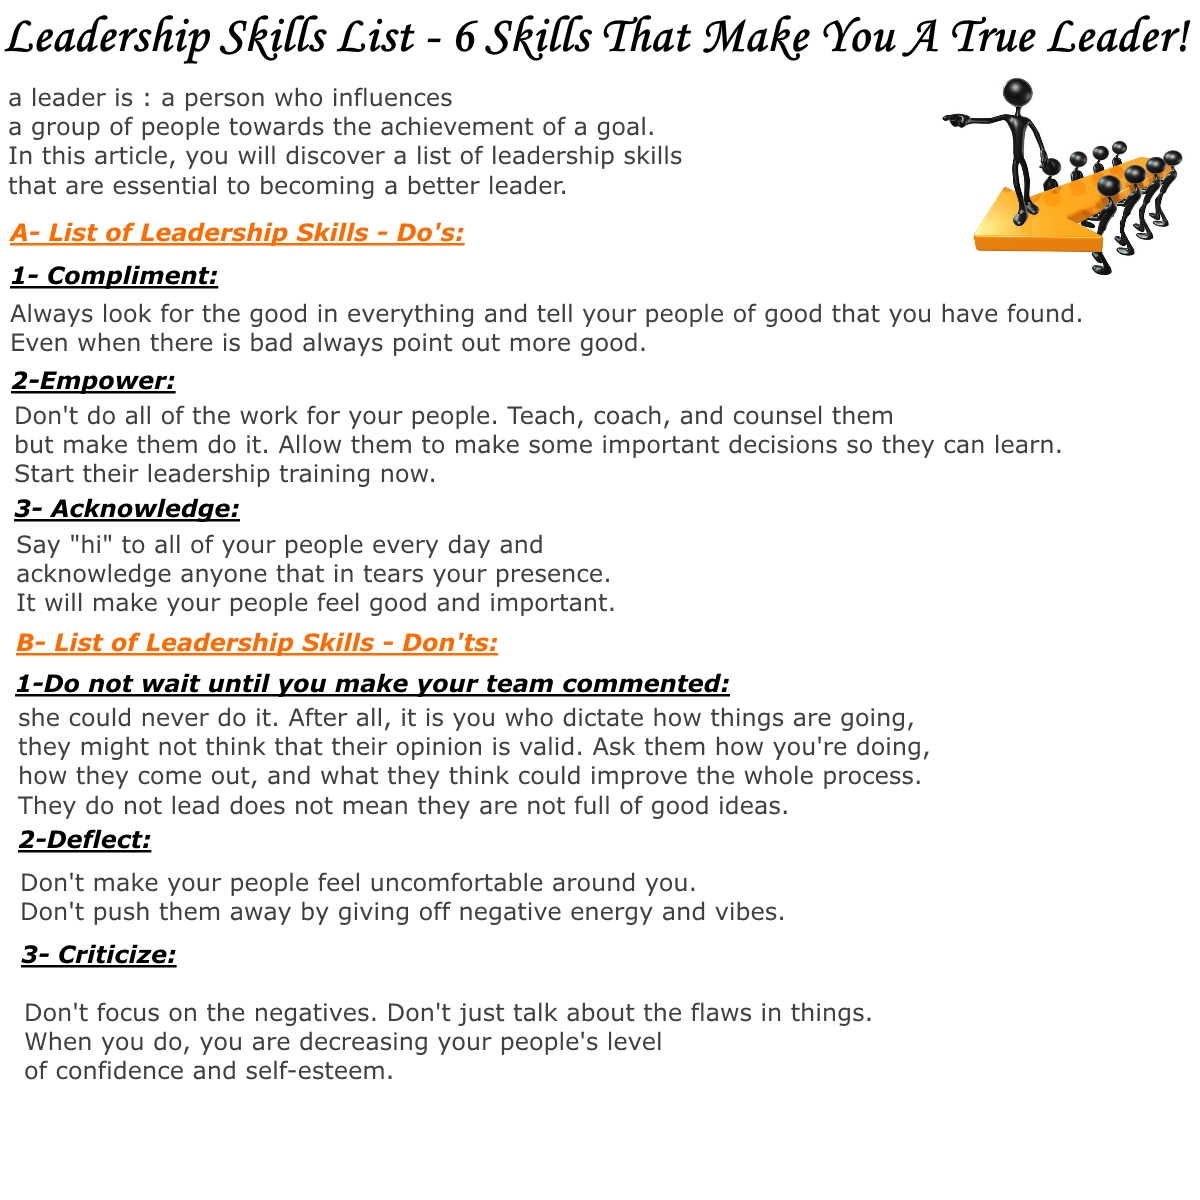 list some skills